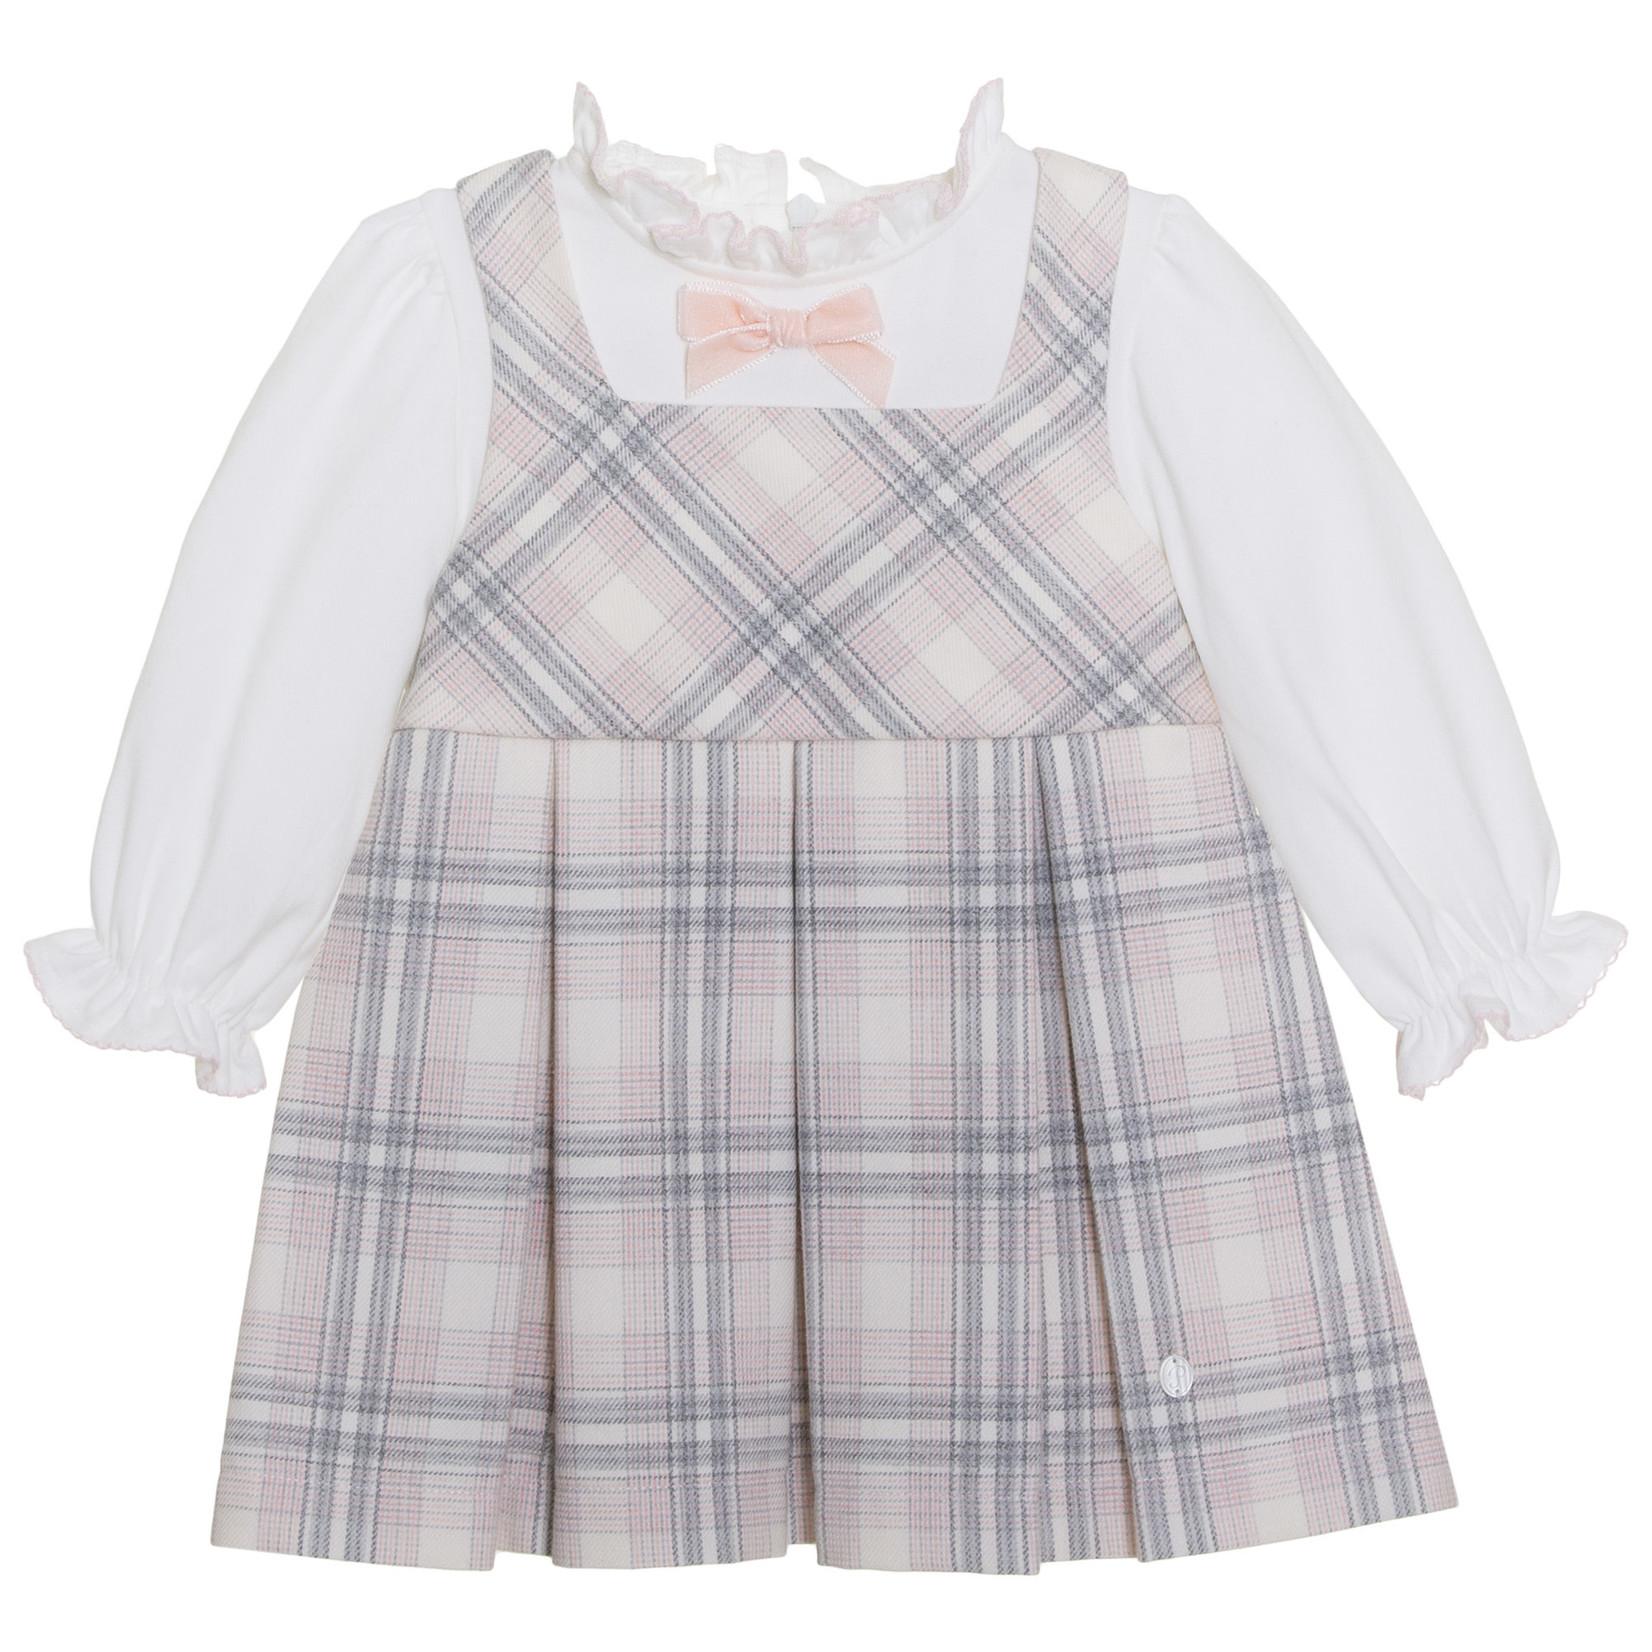 Patachou Dress Bibi - Patachou